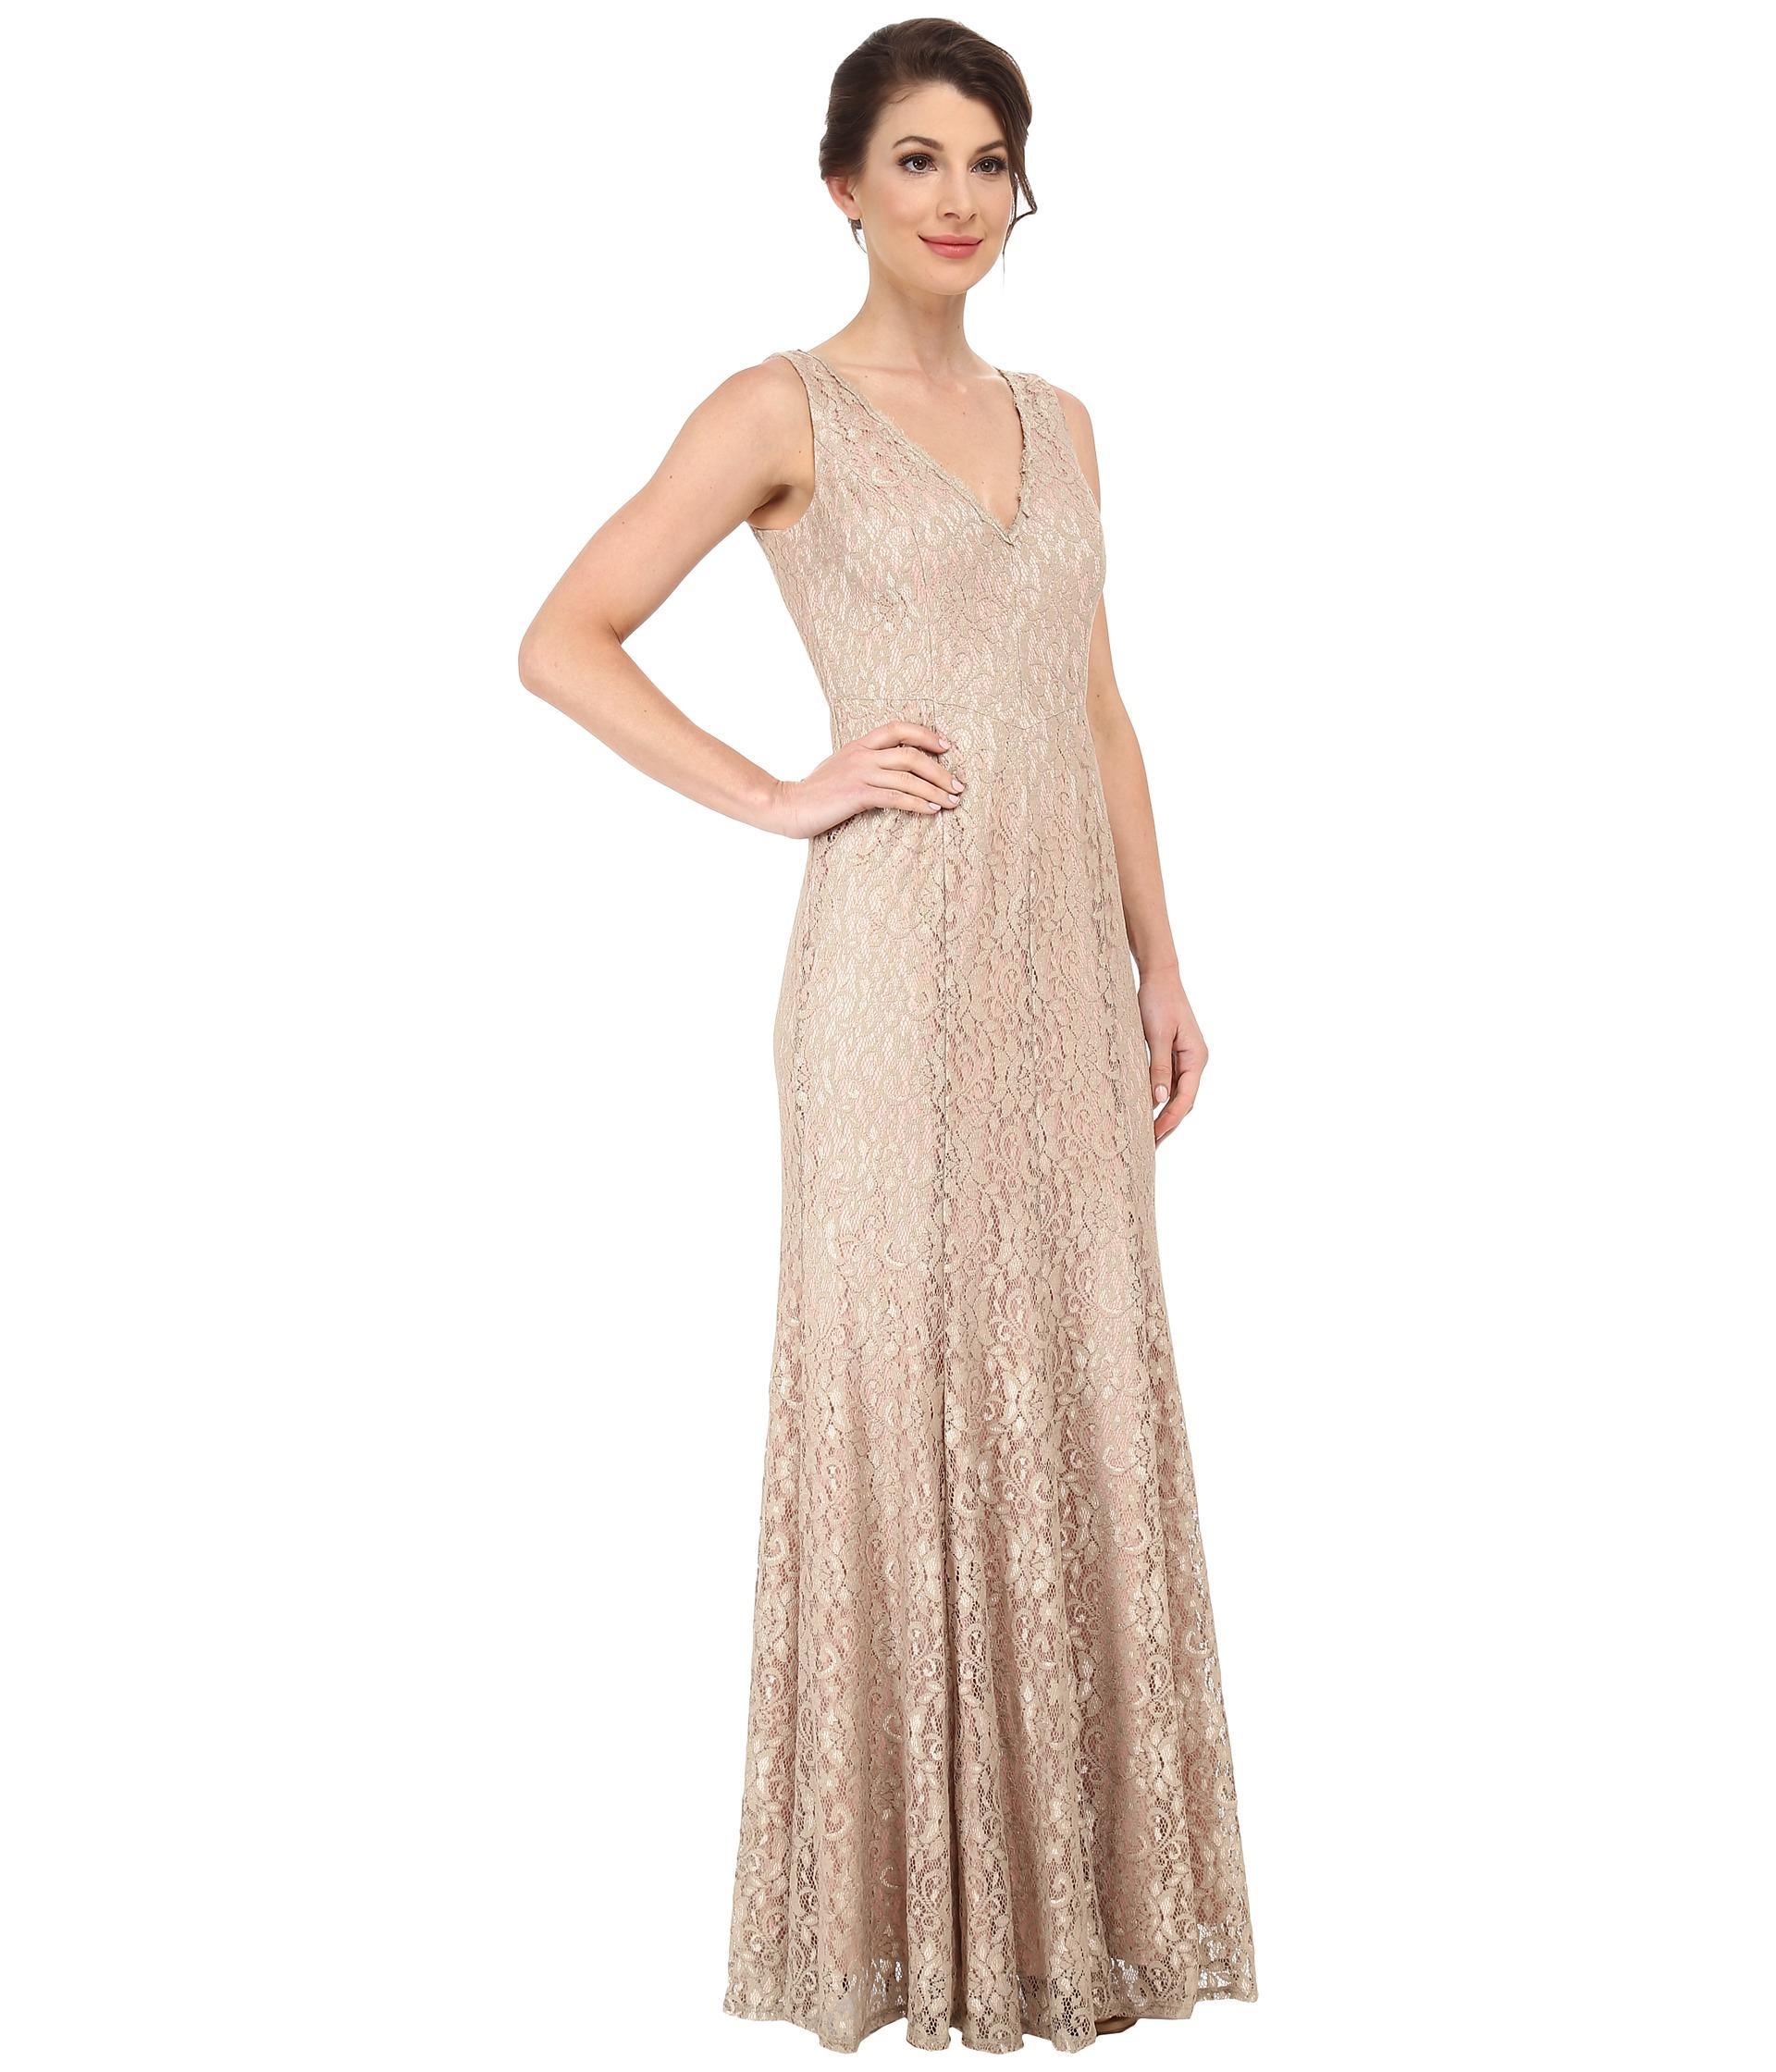 Lyst - Eliza J Sleeveless V-Neck Mermaid Gown in Metallic